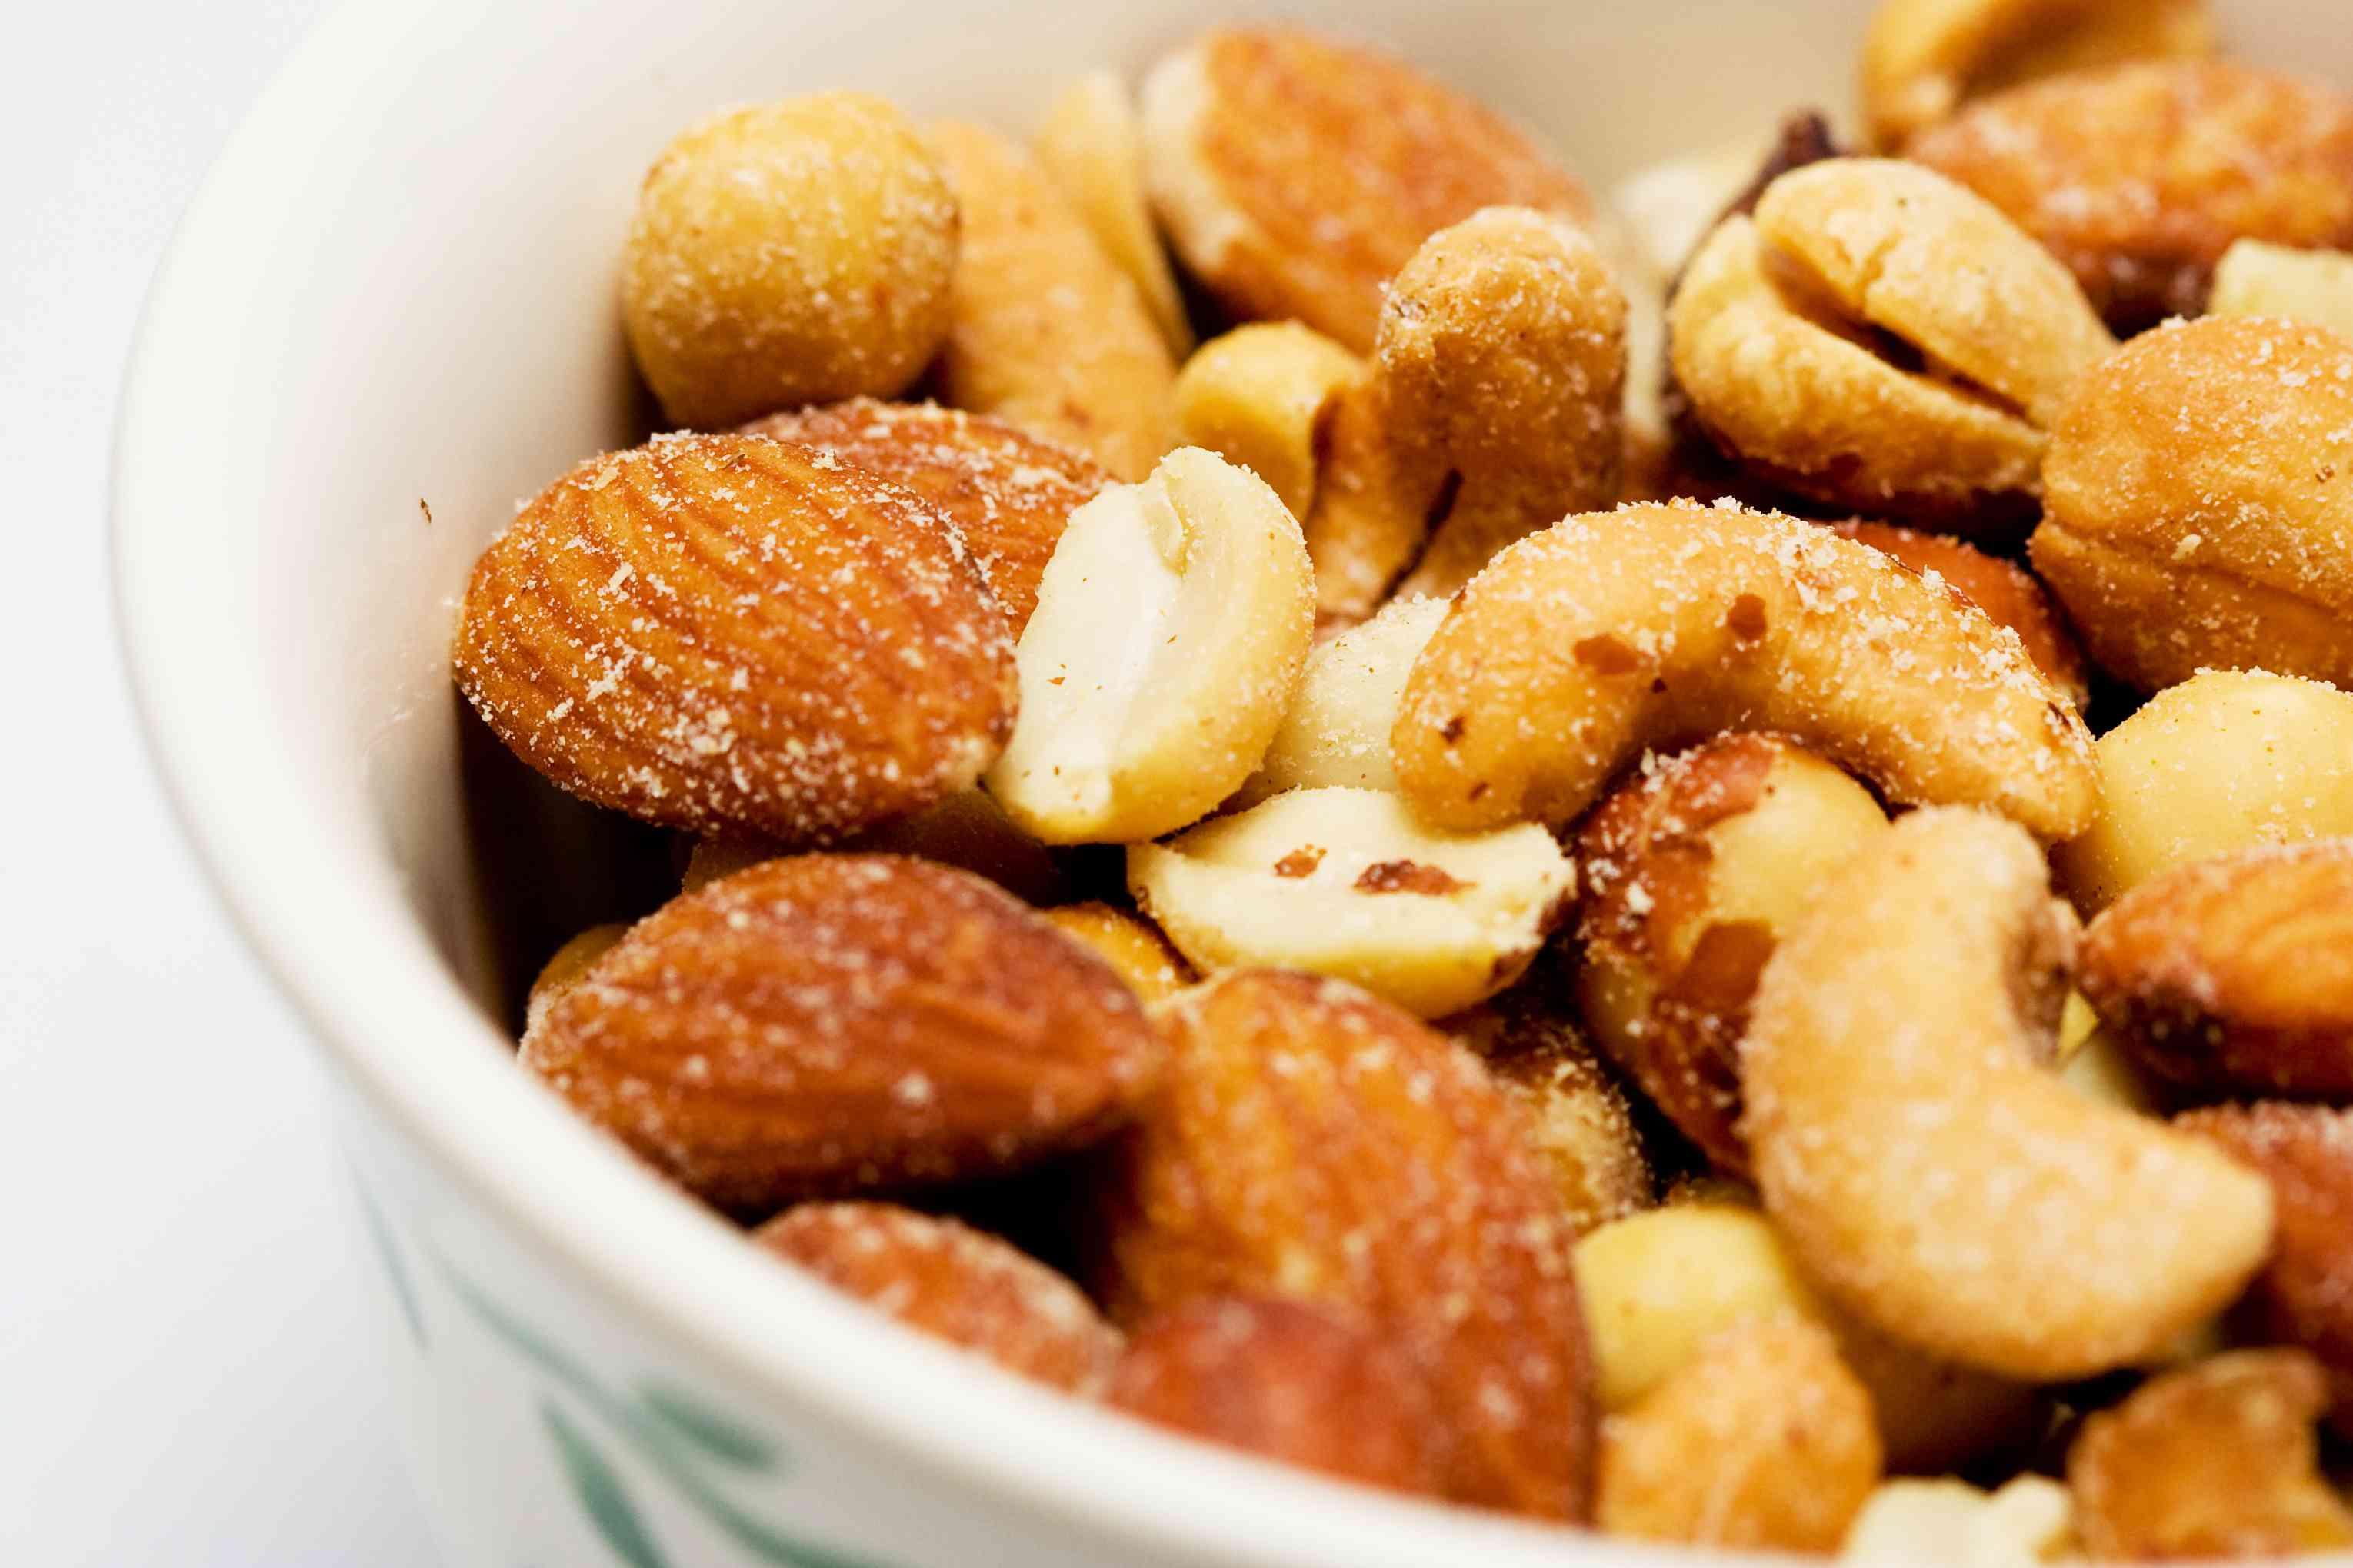 Various salted nuts